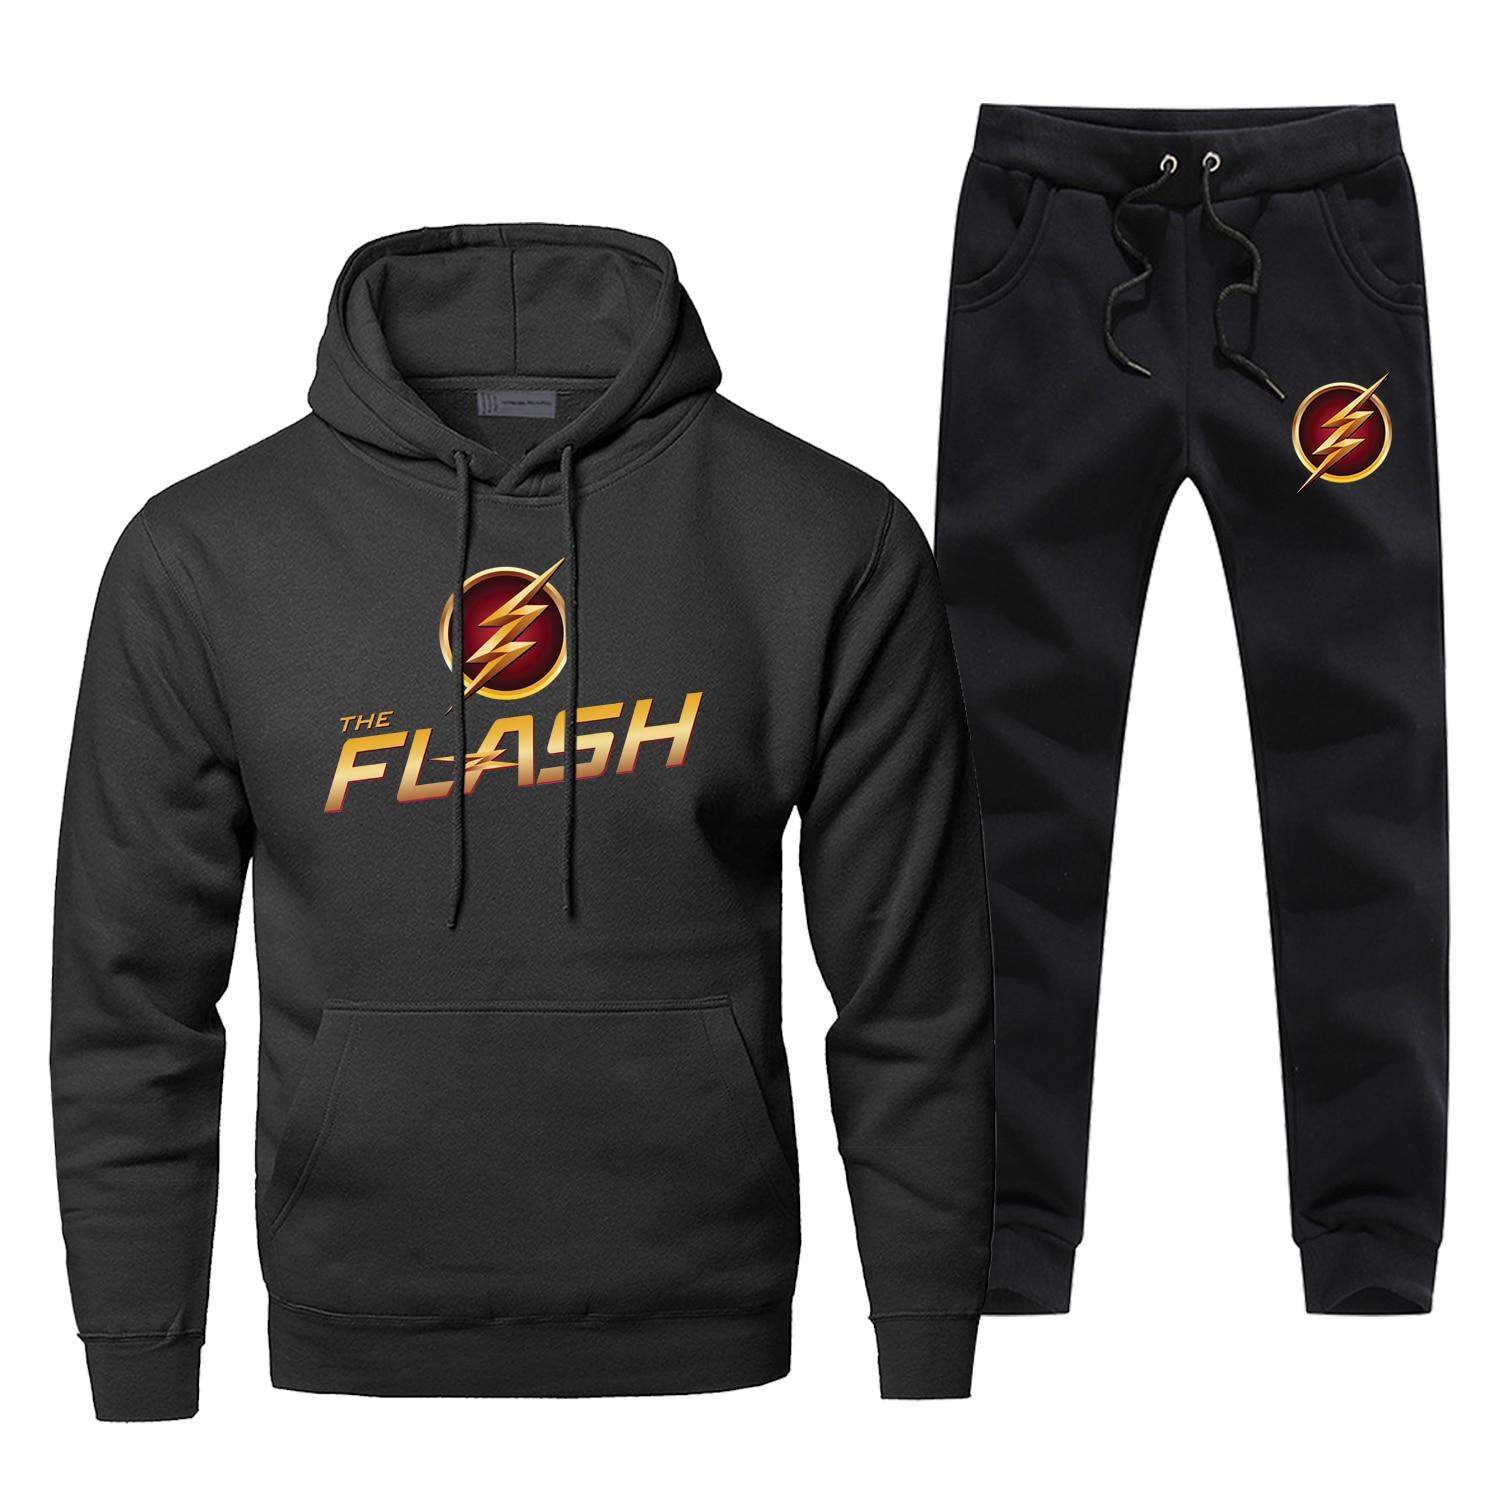 The Big Bang Theory Sweatshirt Men The Flash Star Hoodies+pants Two Piece Sets Men Casual Sportswear Hip Hop Streetwear